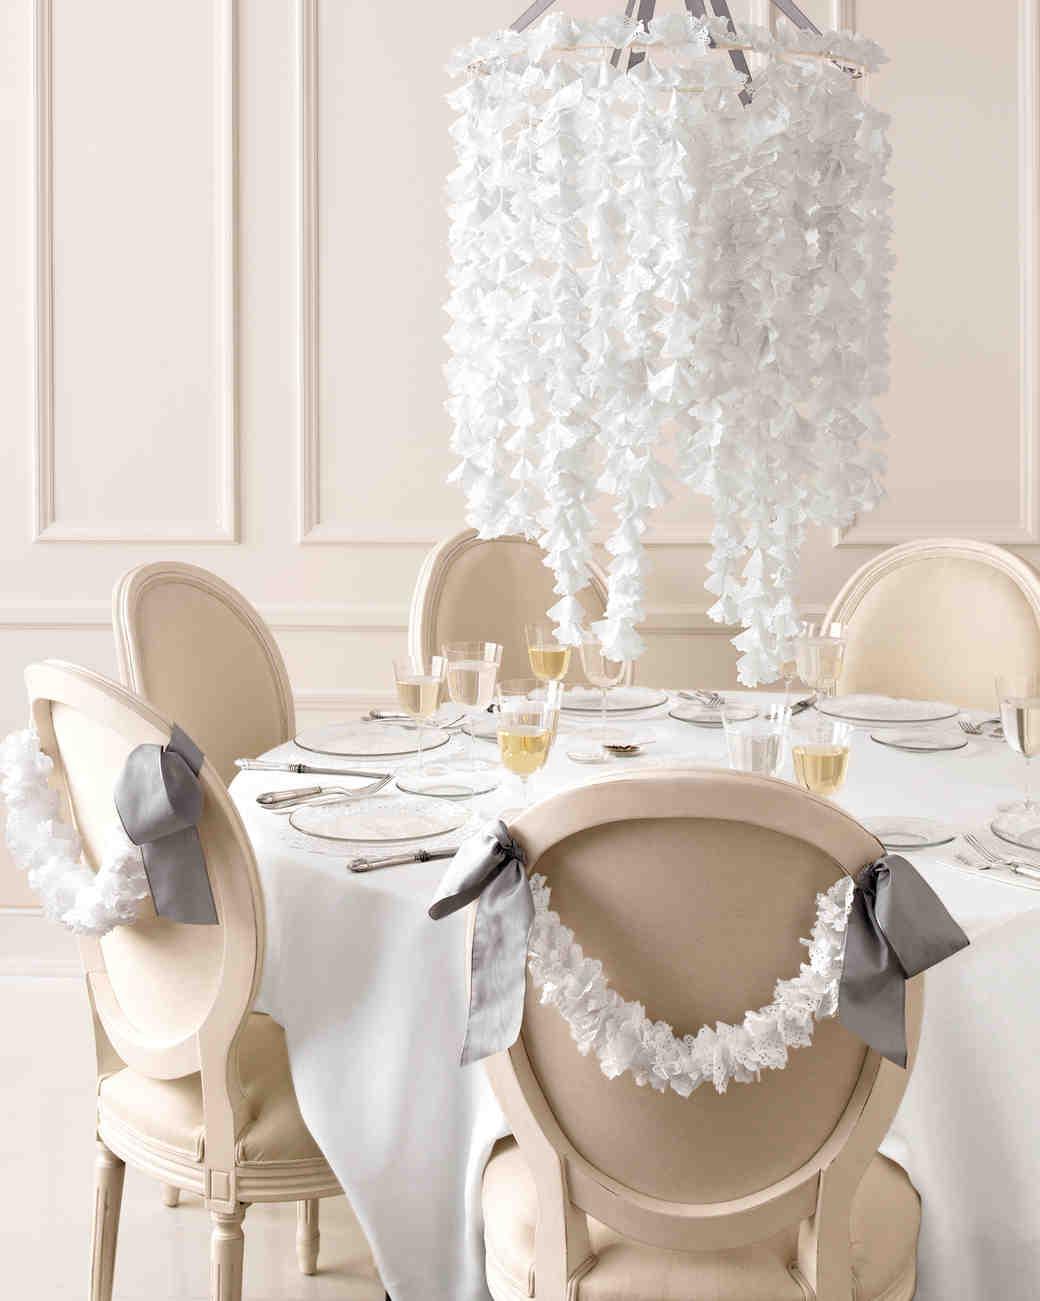 17 Overhead Wedding Decoration Ideas We Love | Martha Stewart Weddings